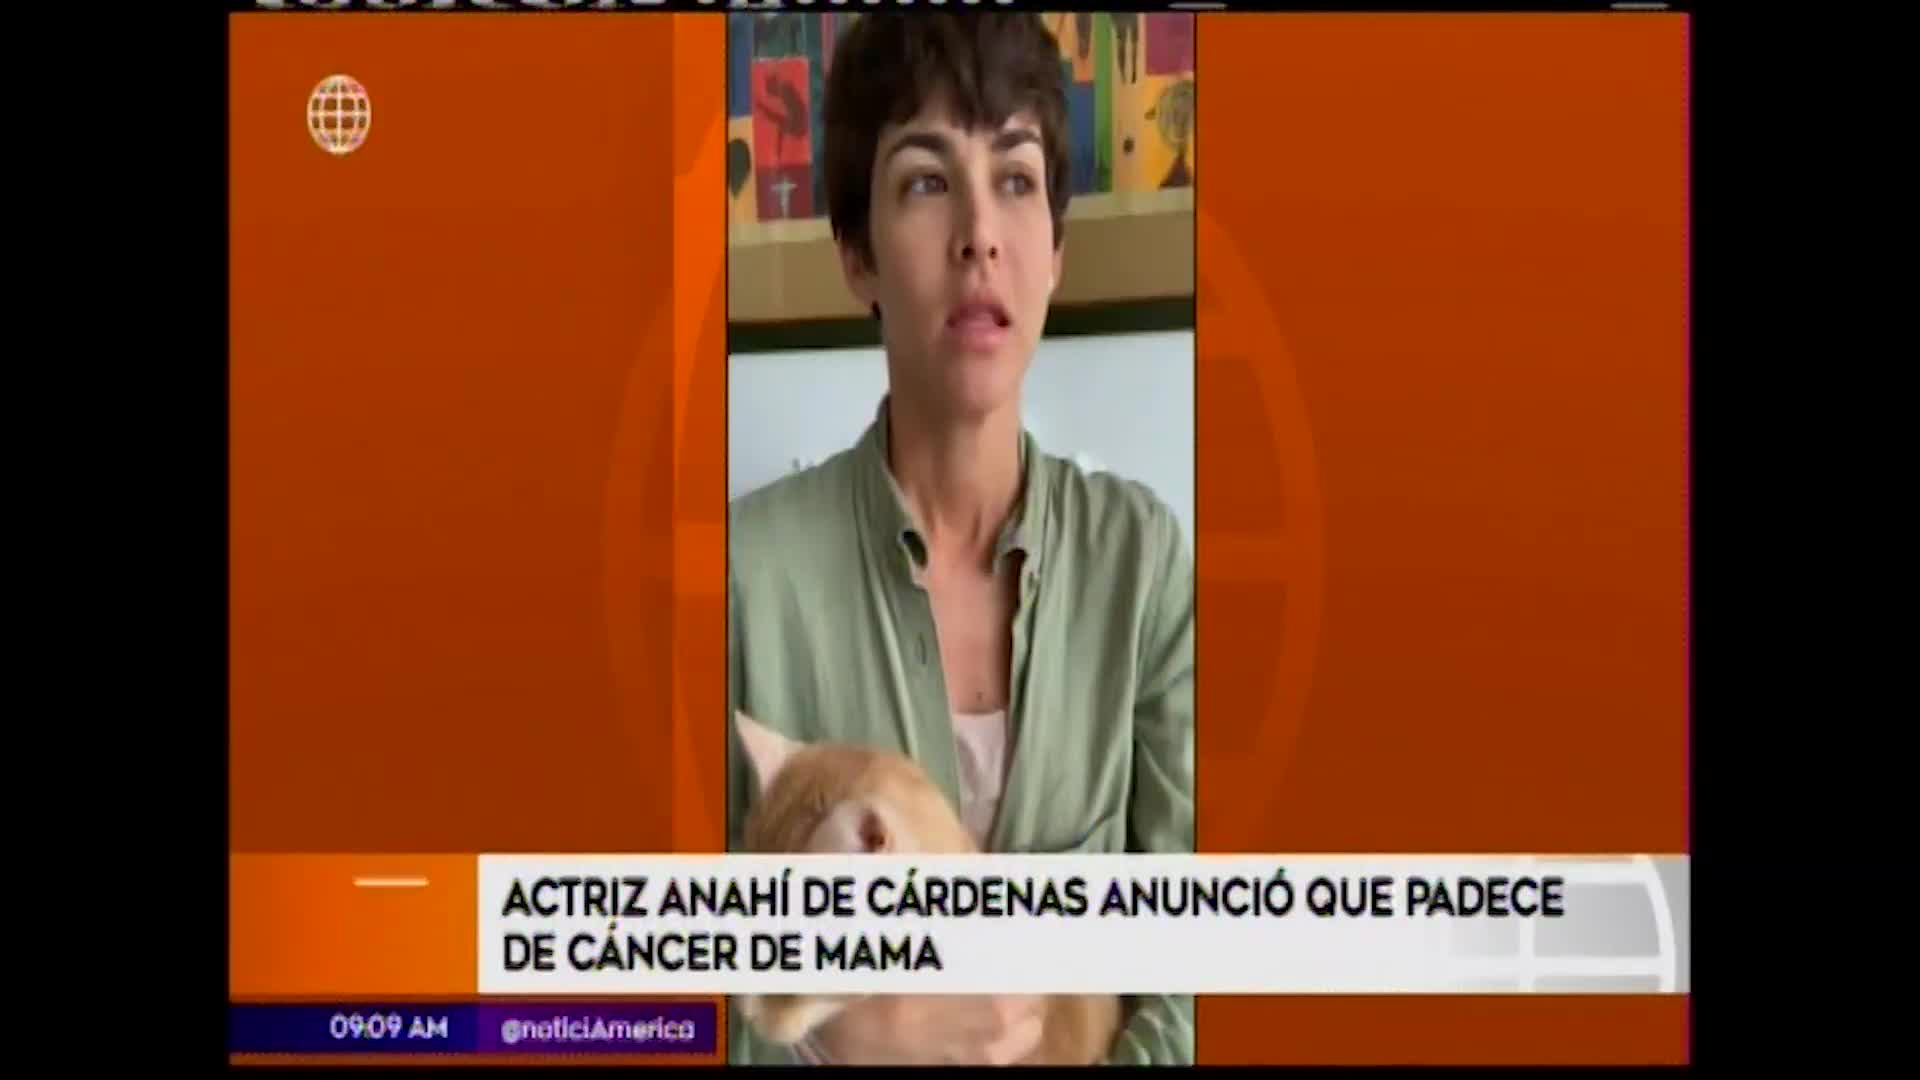 Anahí de Cárdenas anuncia que sufre cáncer de mama